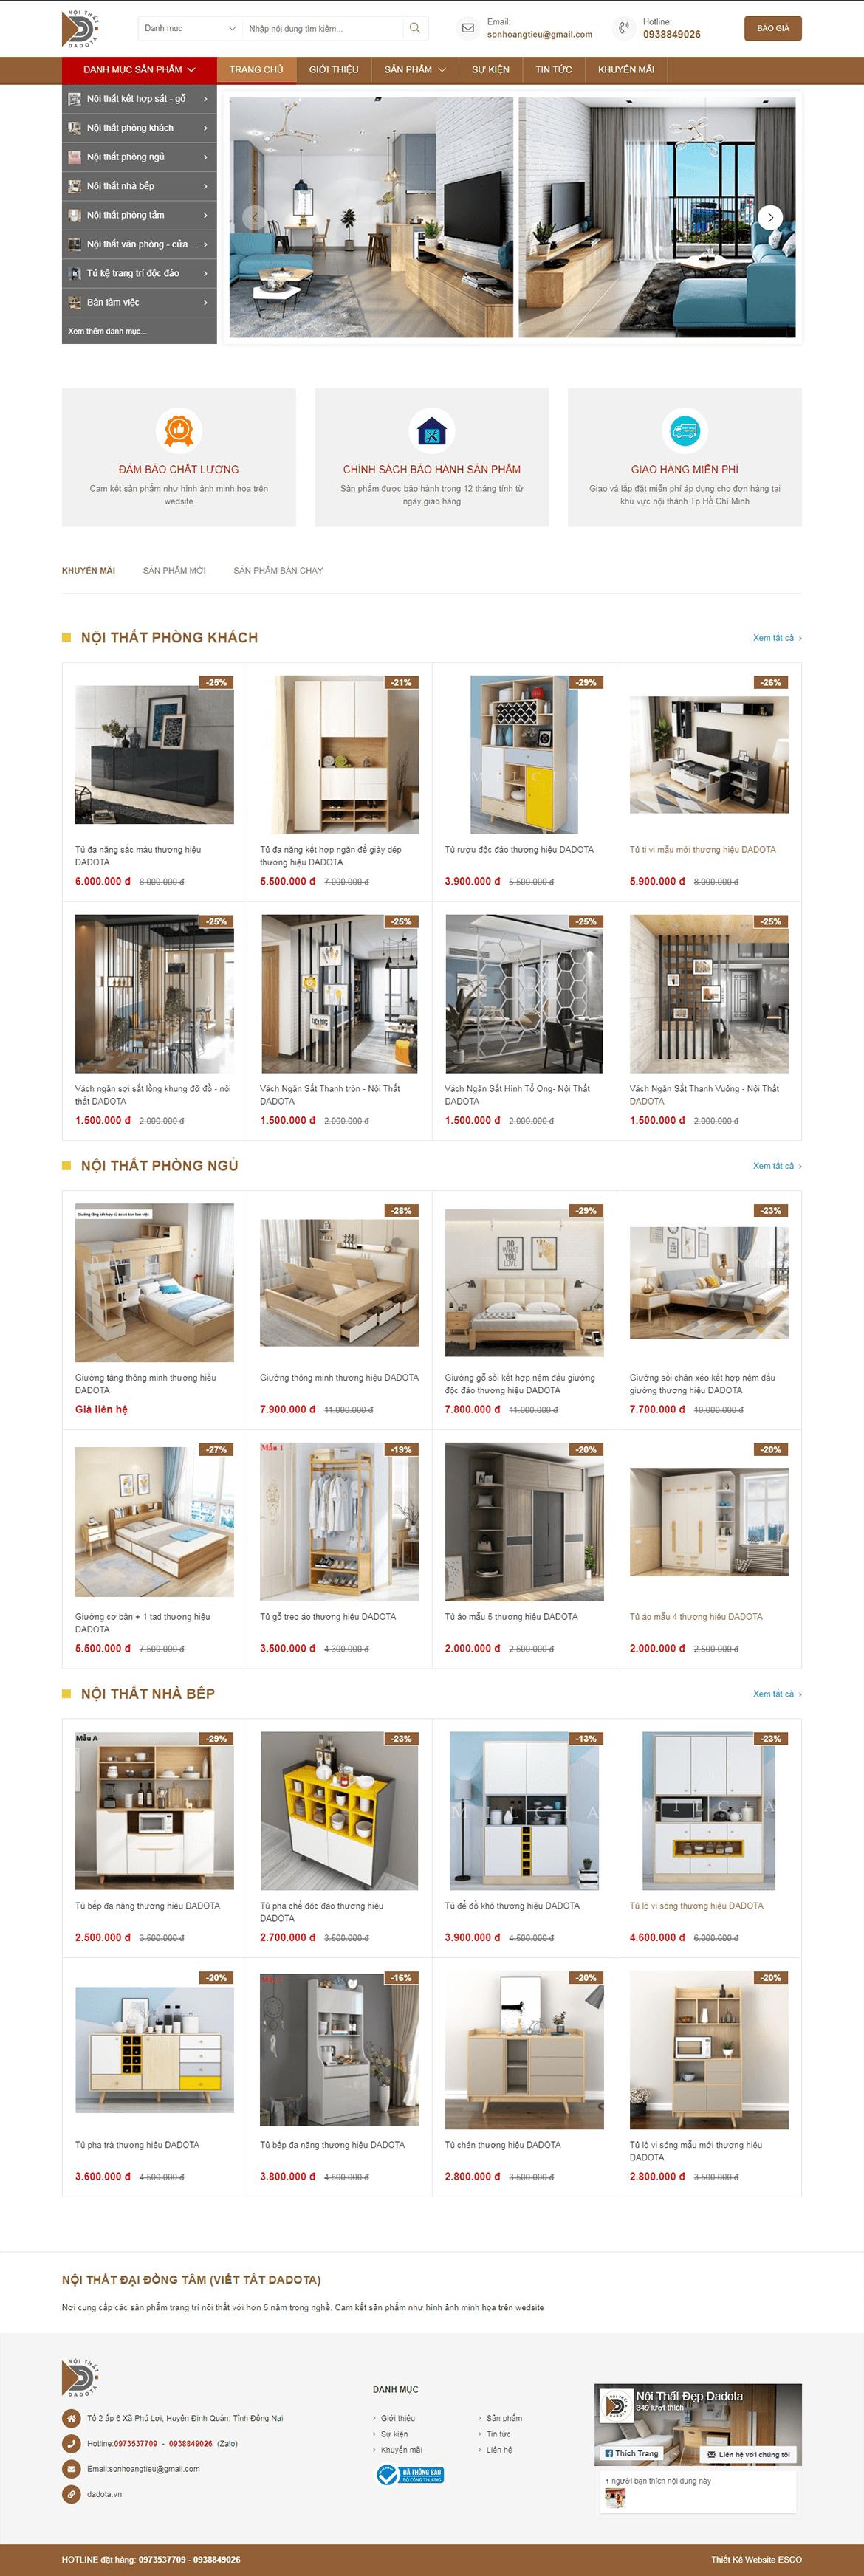 Thiết kế website nội thất dadota.vn